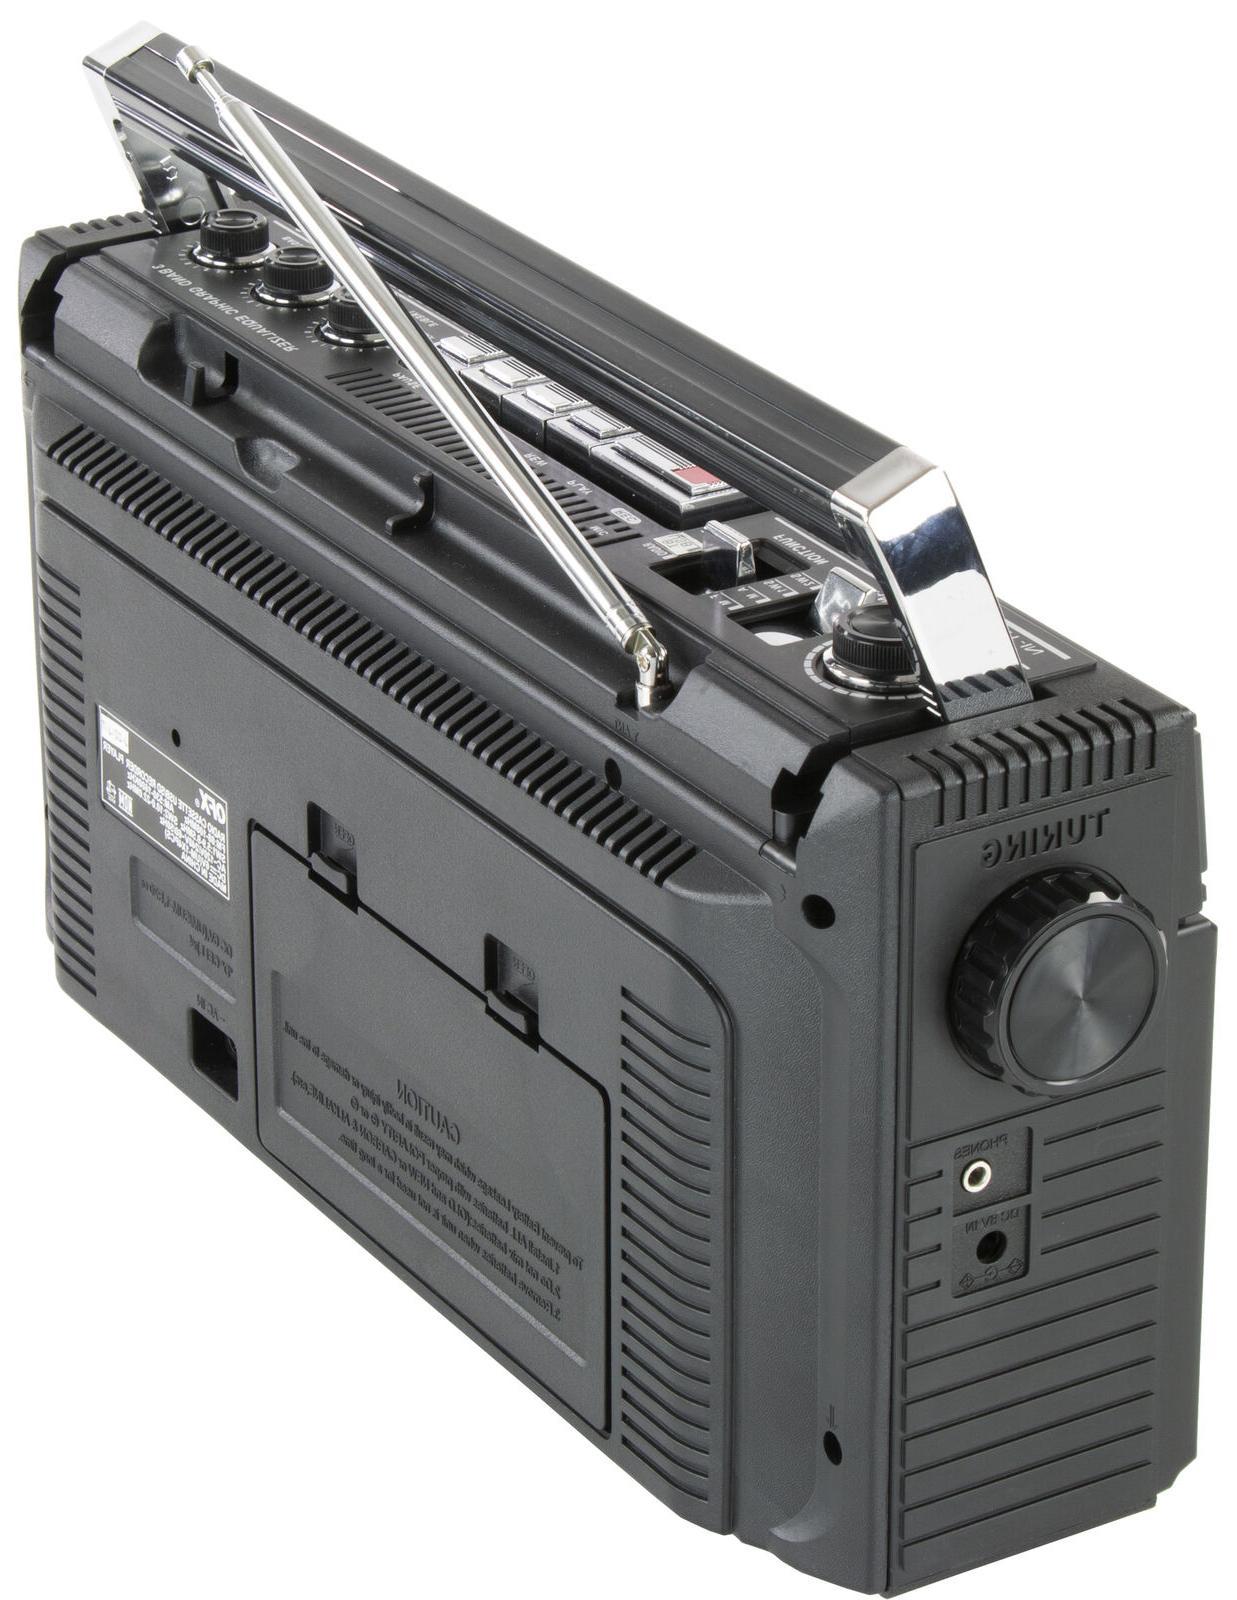 QFX Cassette Recorder Boombox